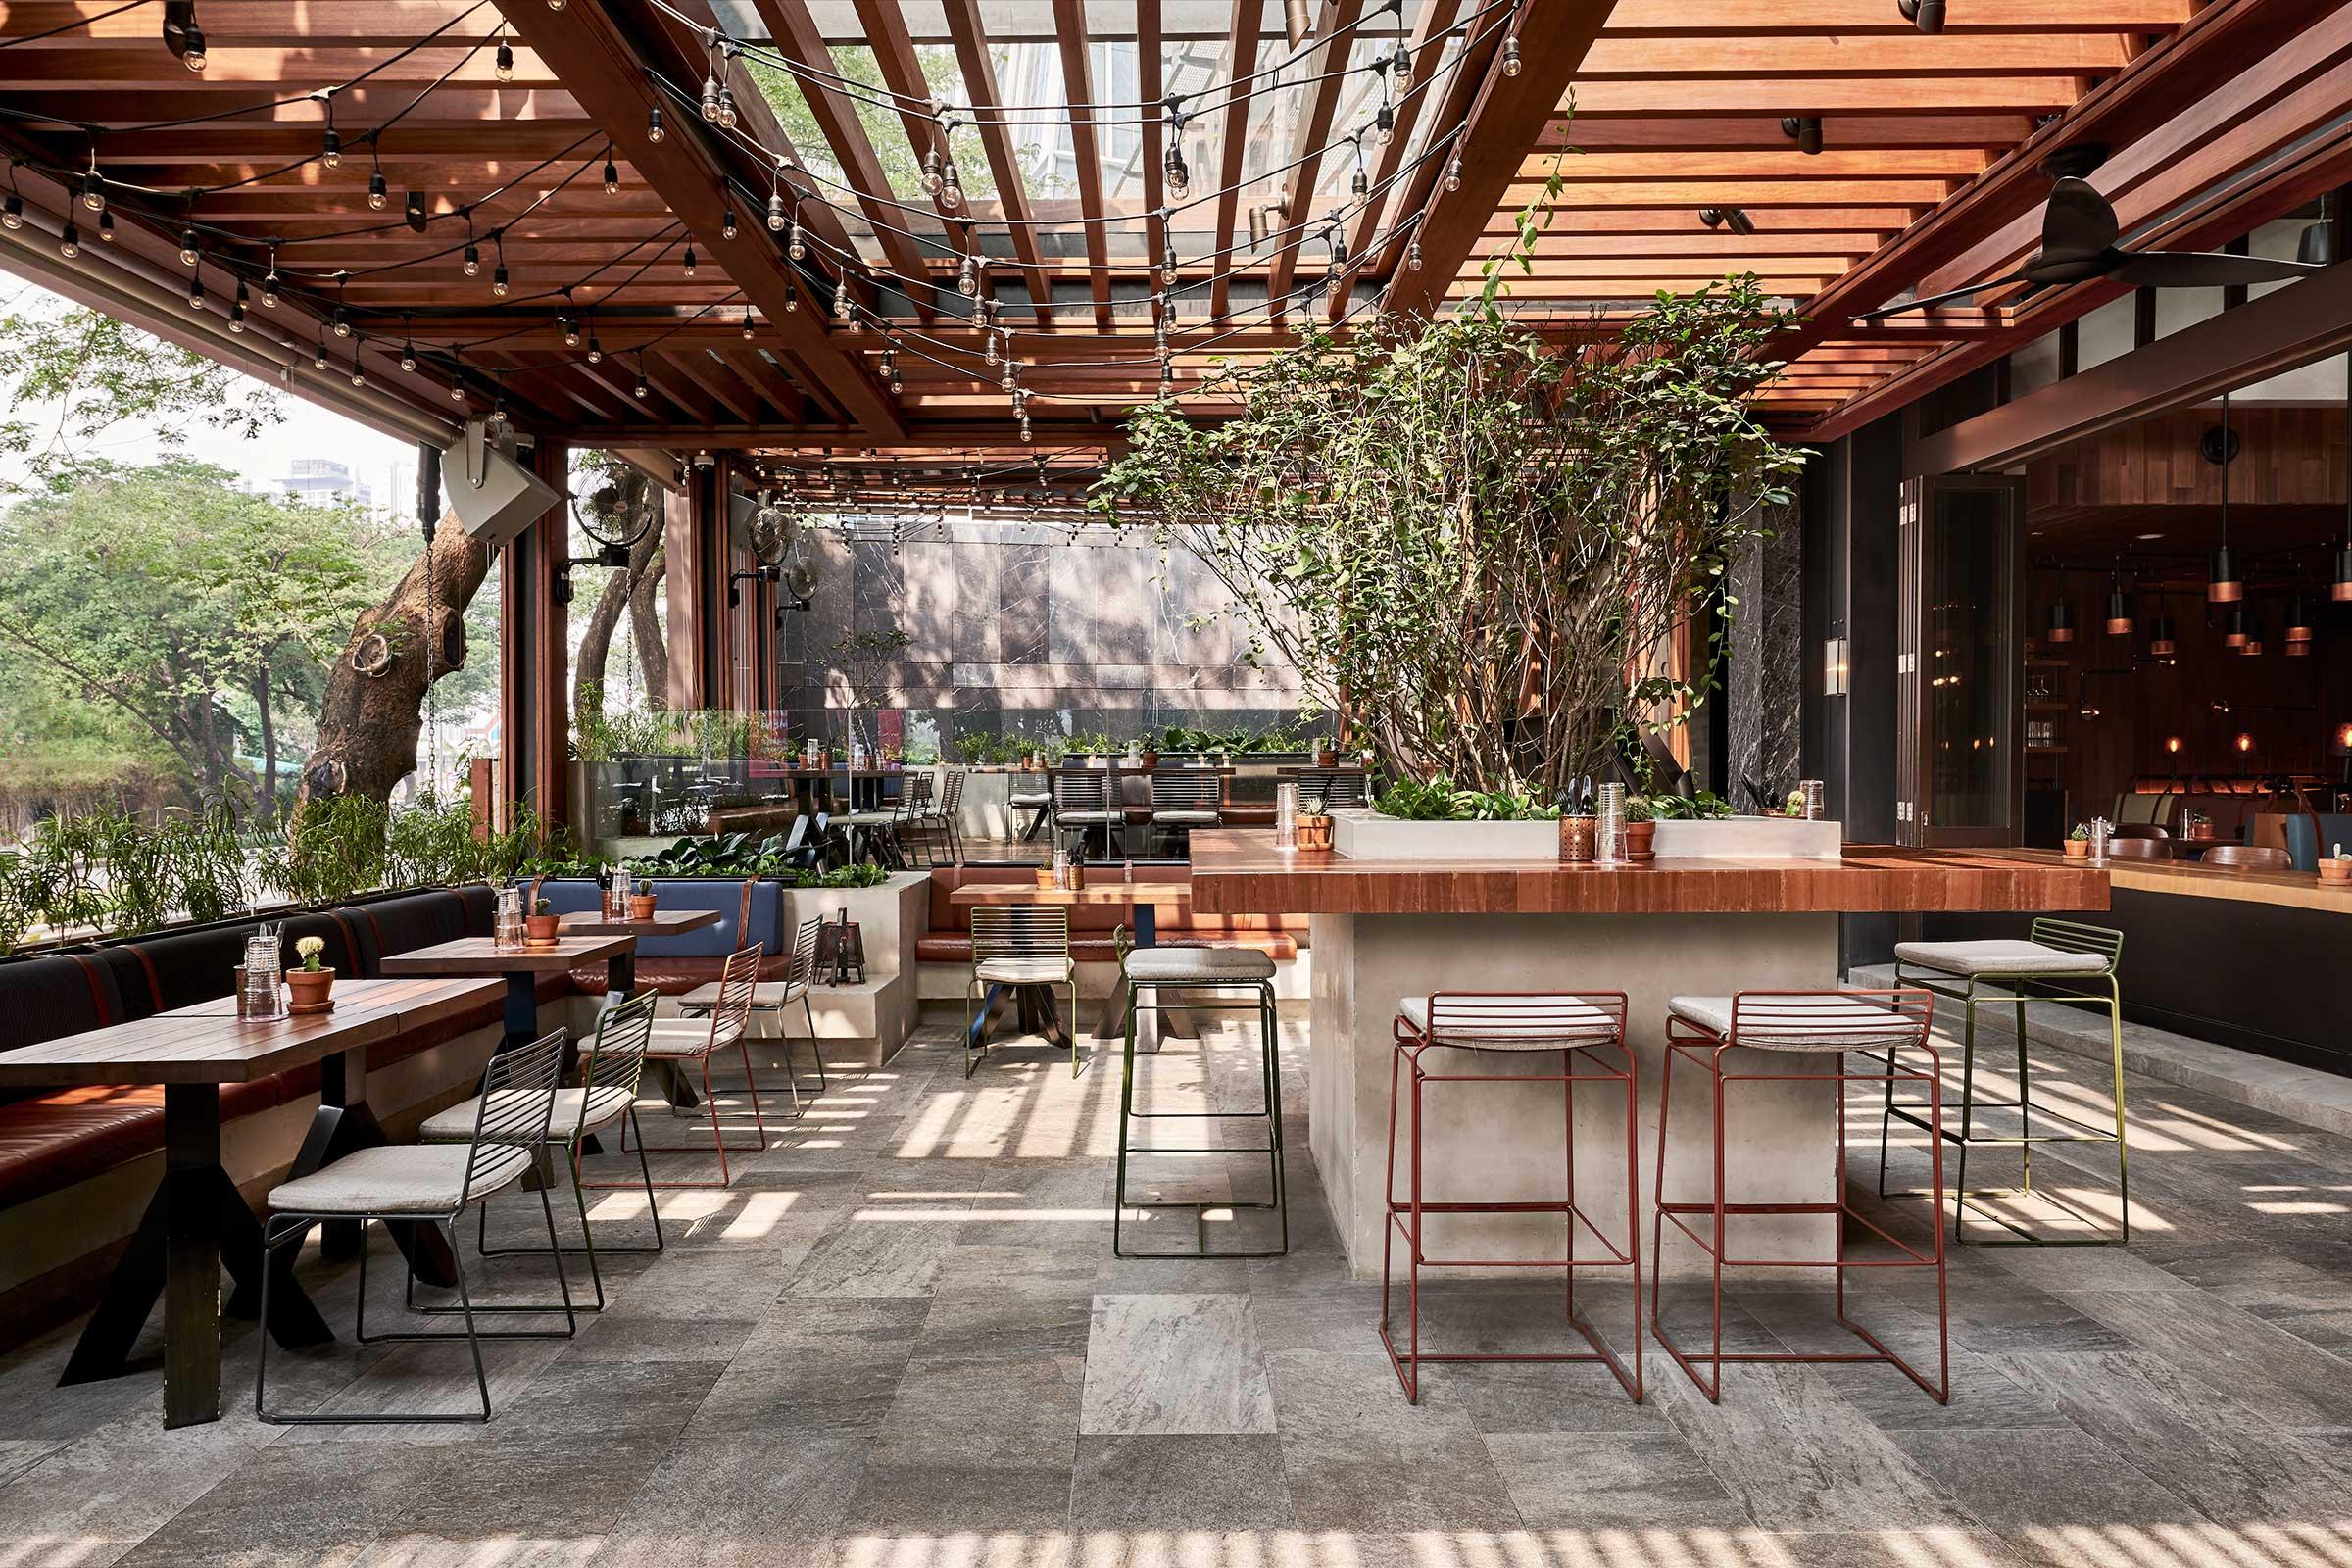 AJS---Dining---Le-Burger---Outdoor-Bar.jpg